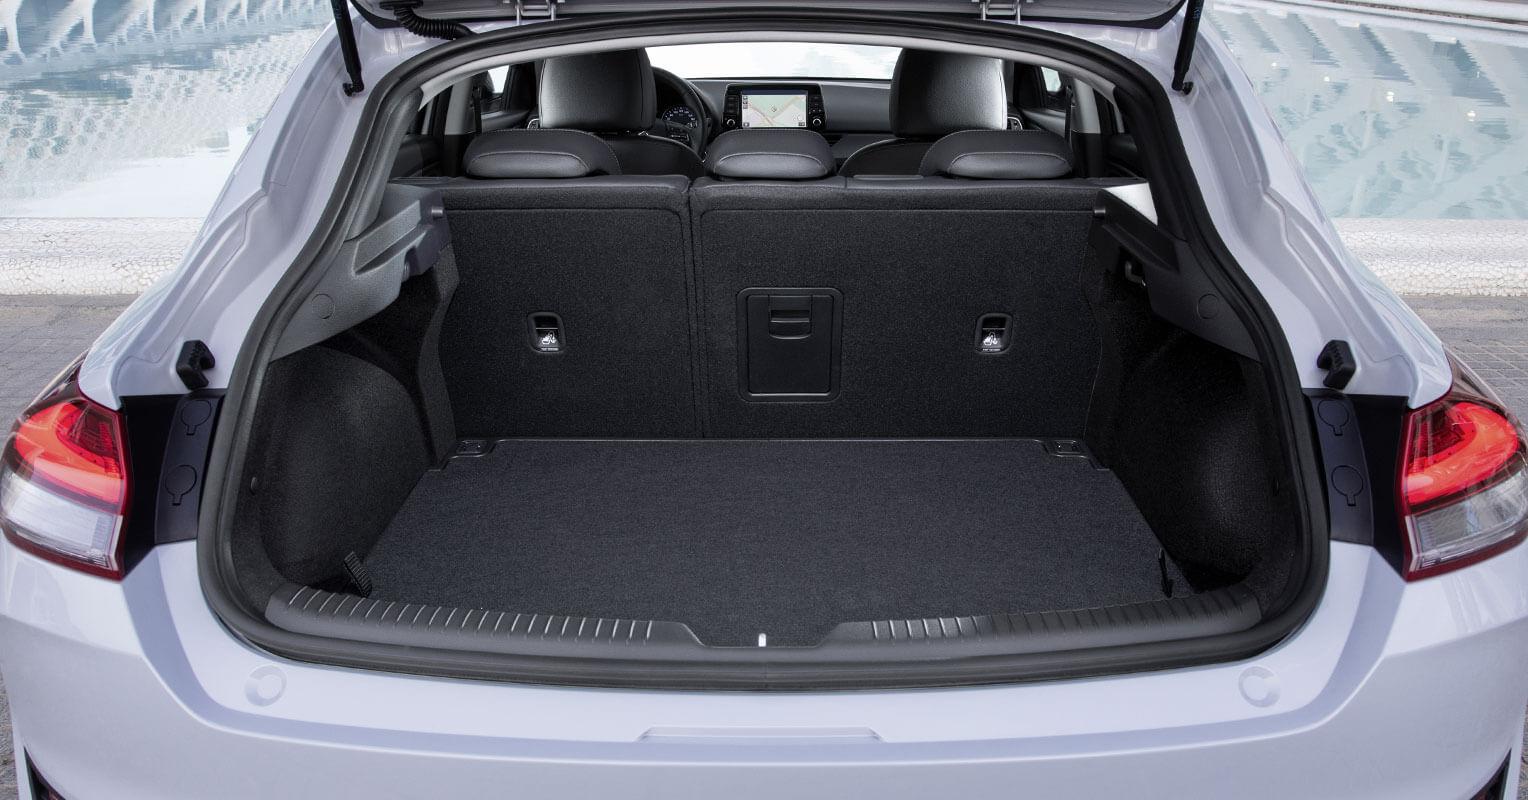 Maletero del Hyundai i30 Fastback 2018